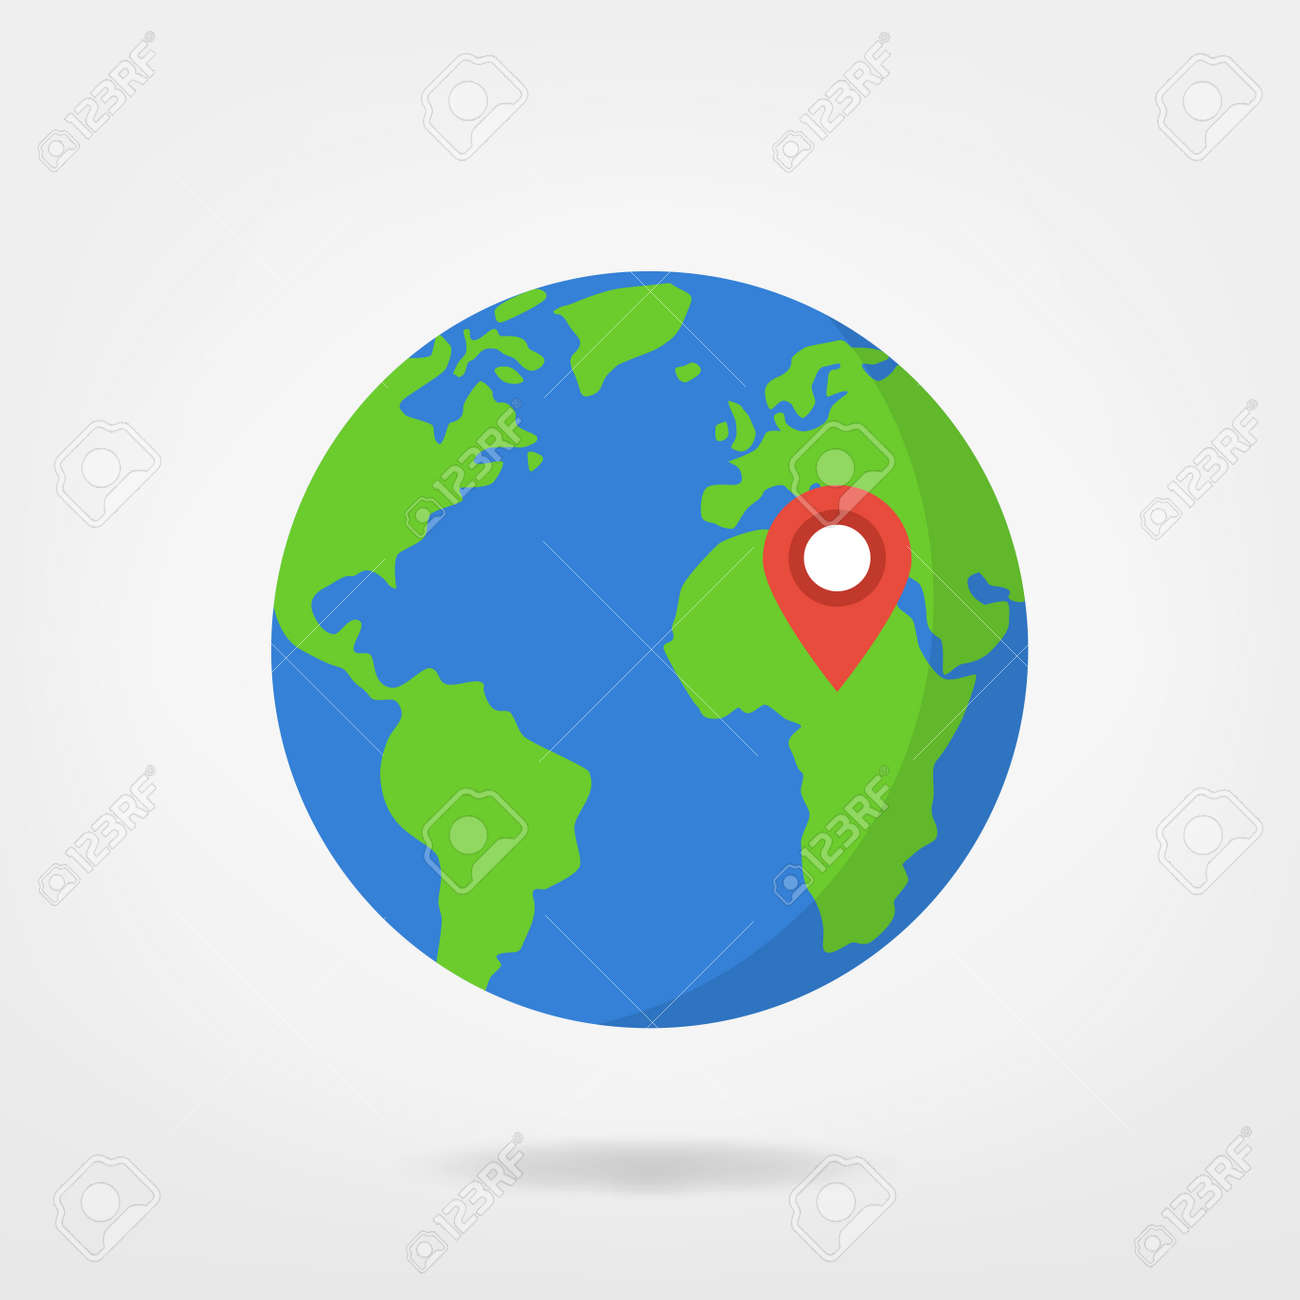 Africa location pin on world illustration world map globe africa location pin on world illustration world map globe with red marker location gumiabroncs Gallery